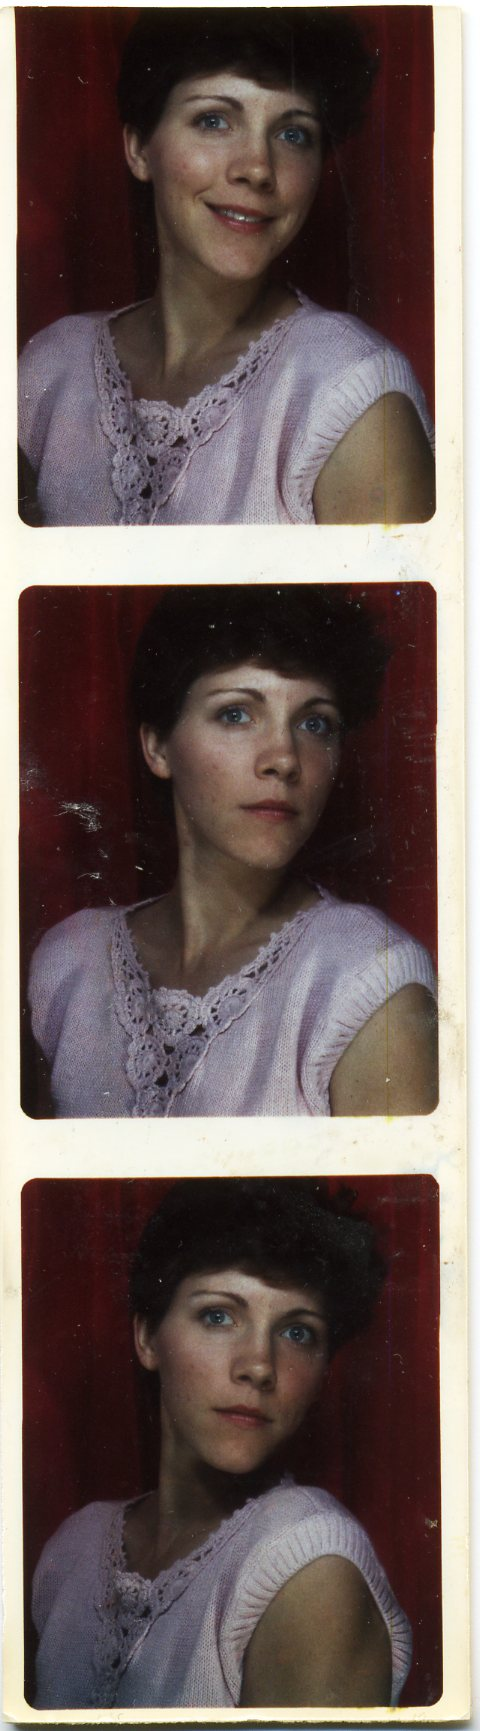 My Mom, Kimberley